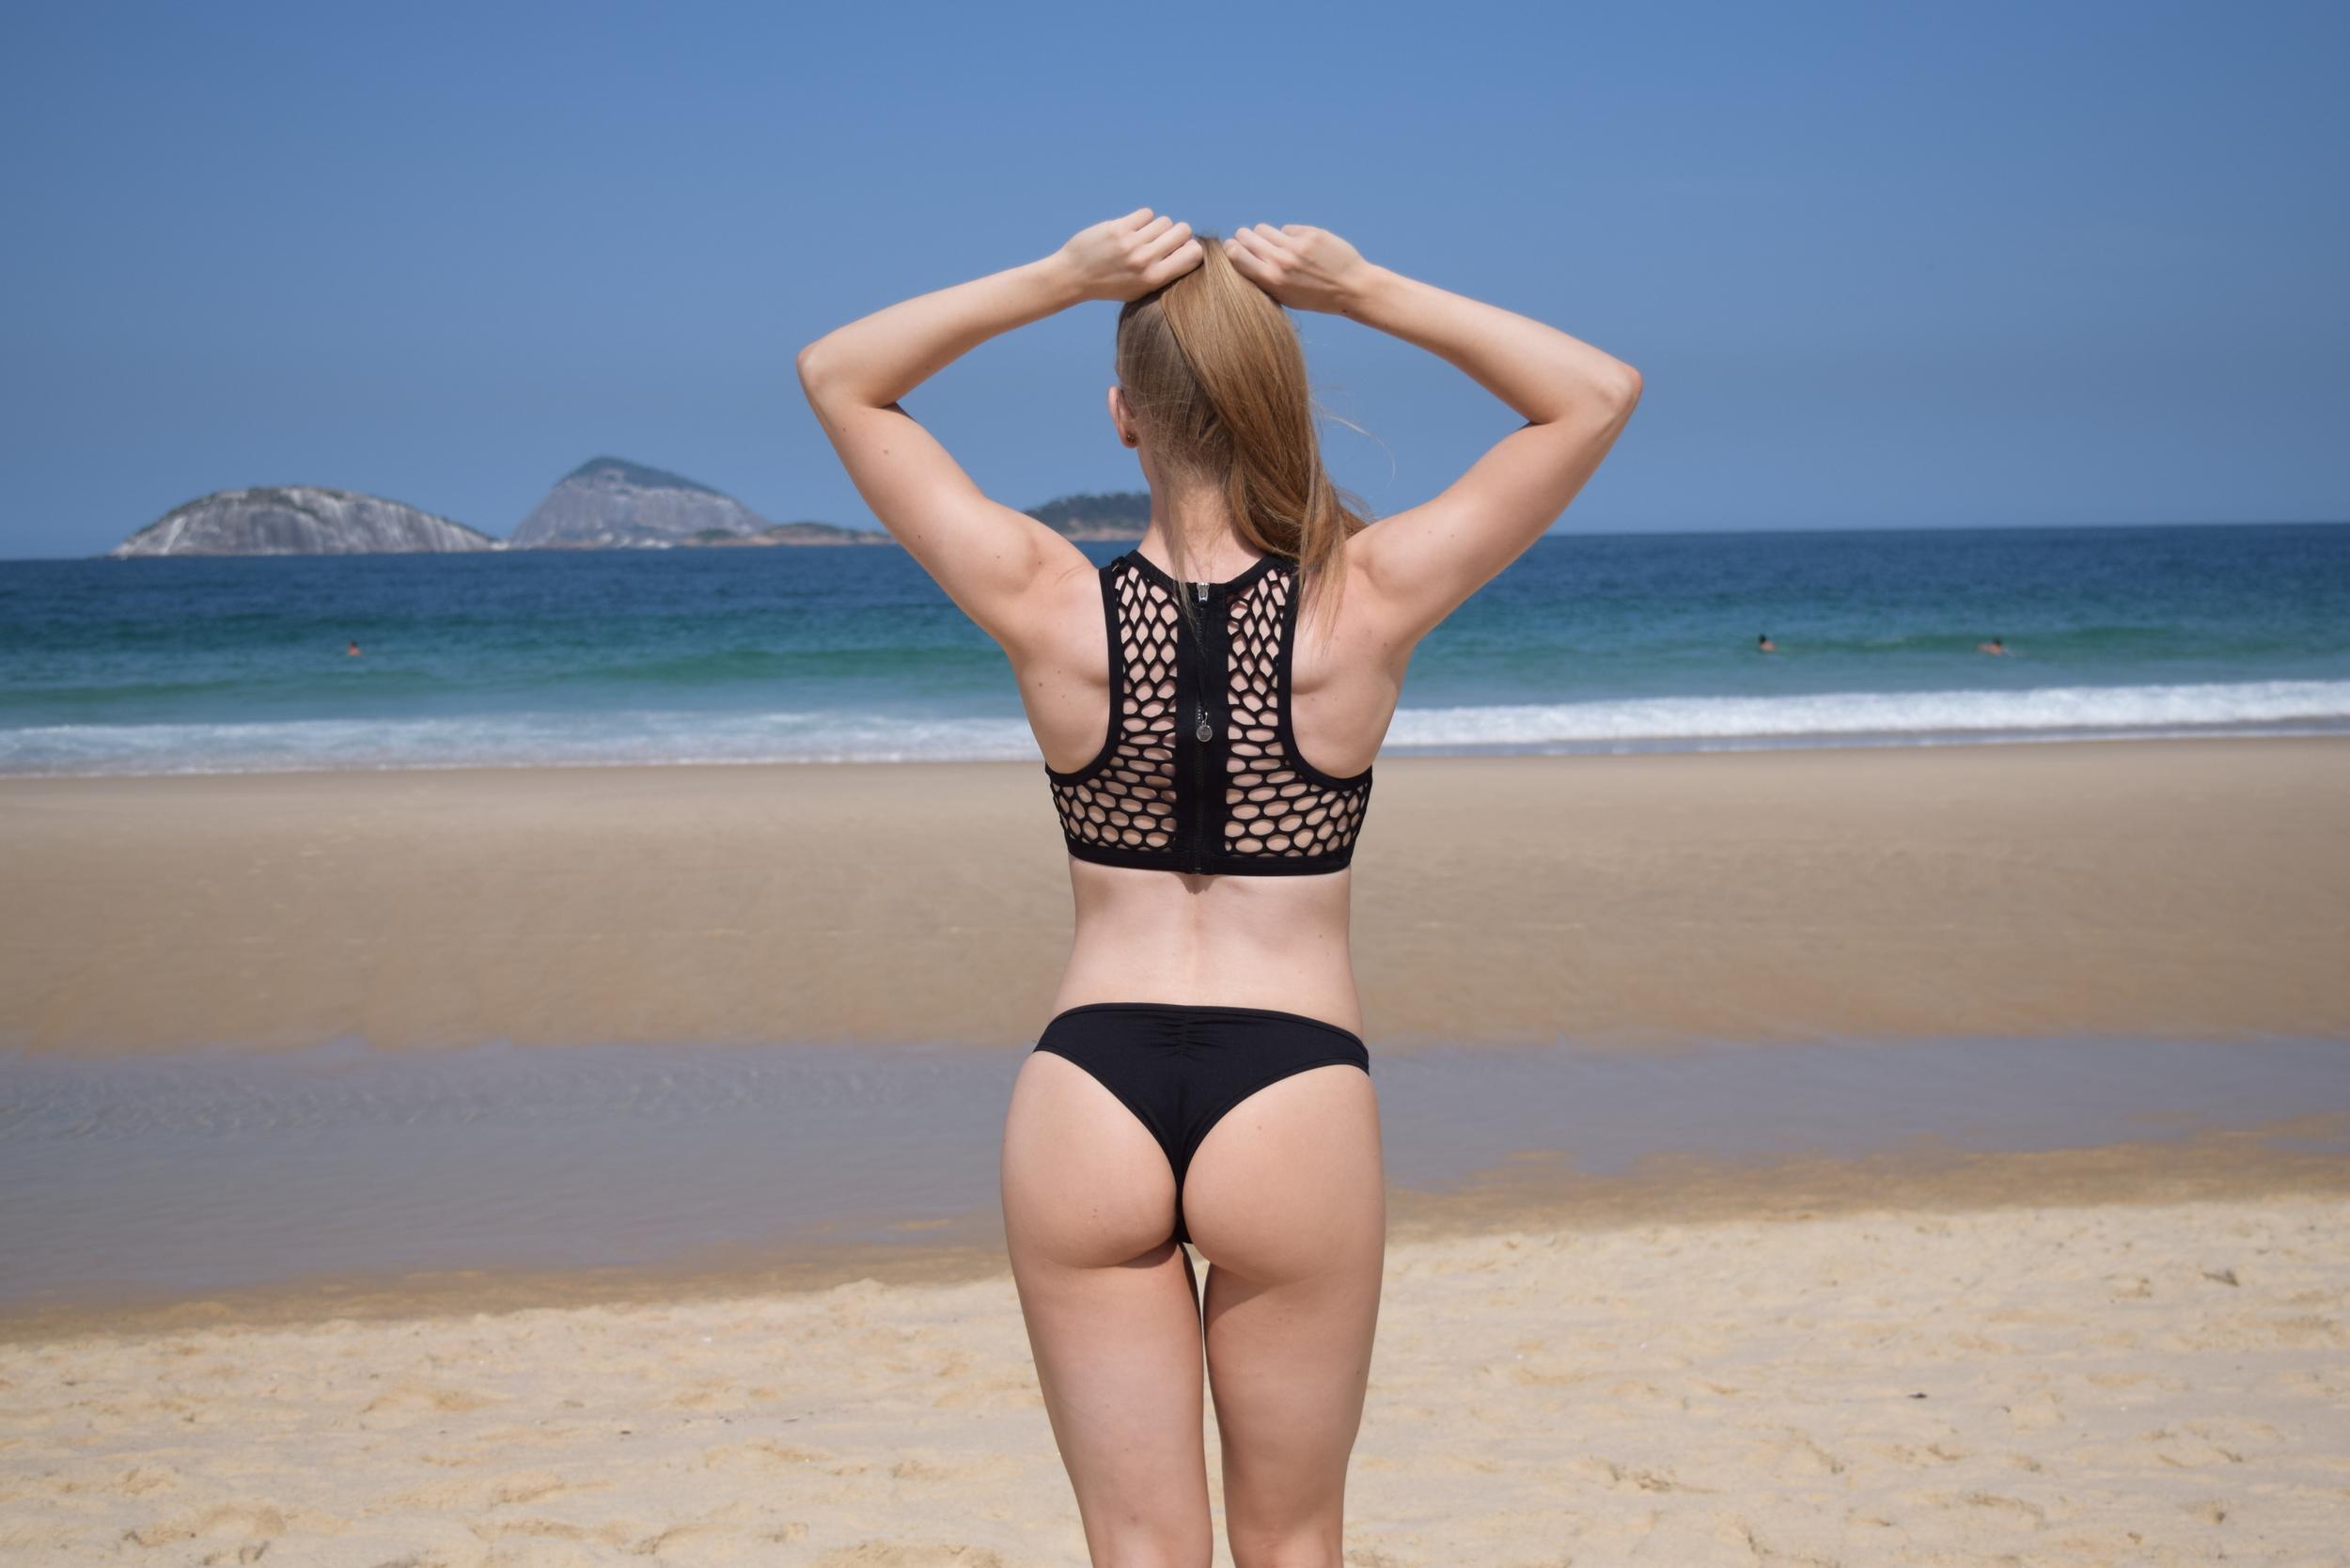 Fitness-Blogger-Rio-Olympics-Brazil-Bikini